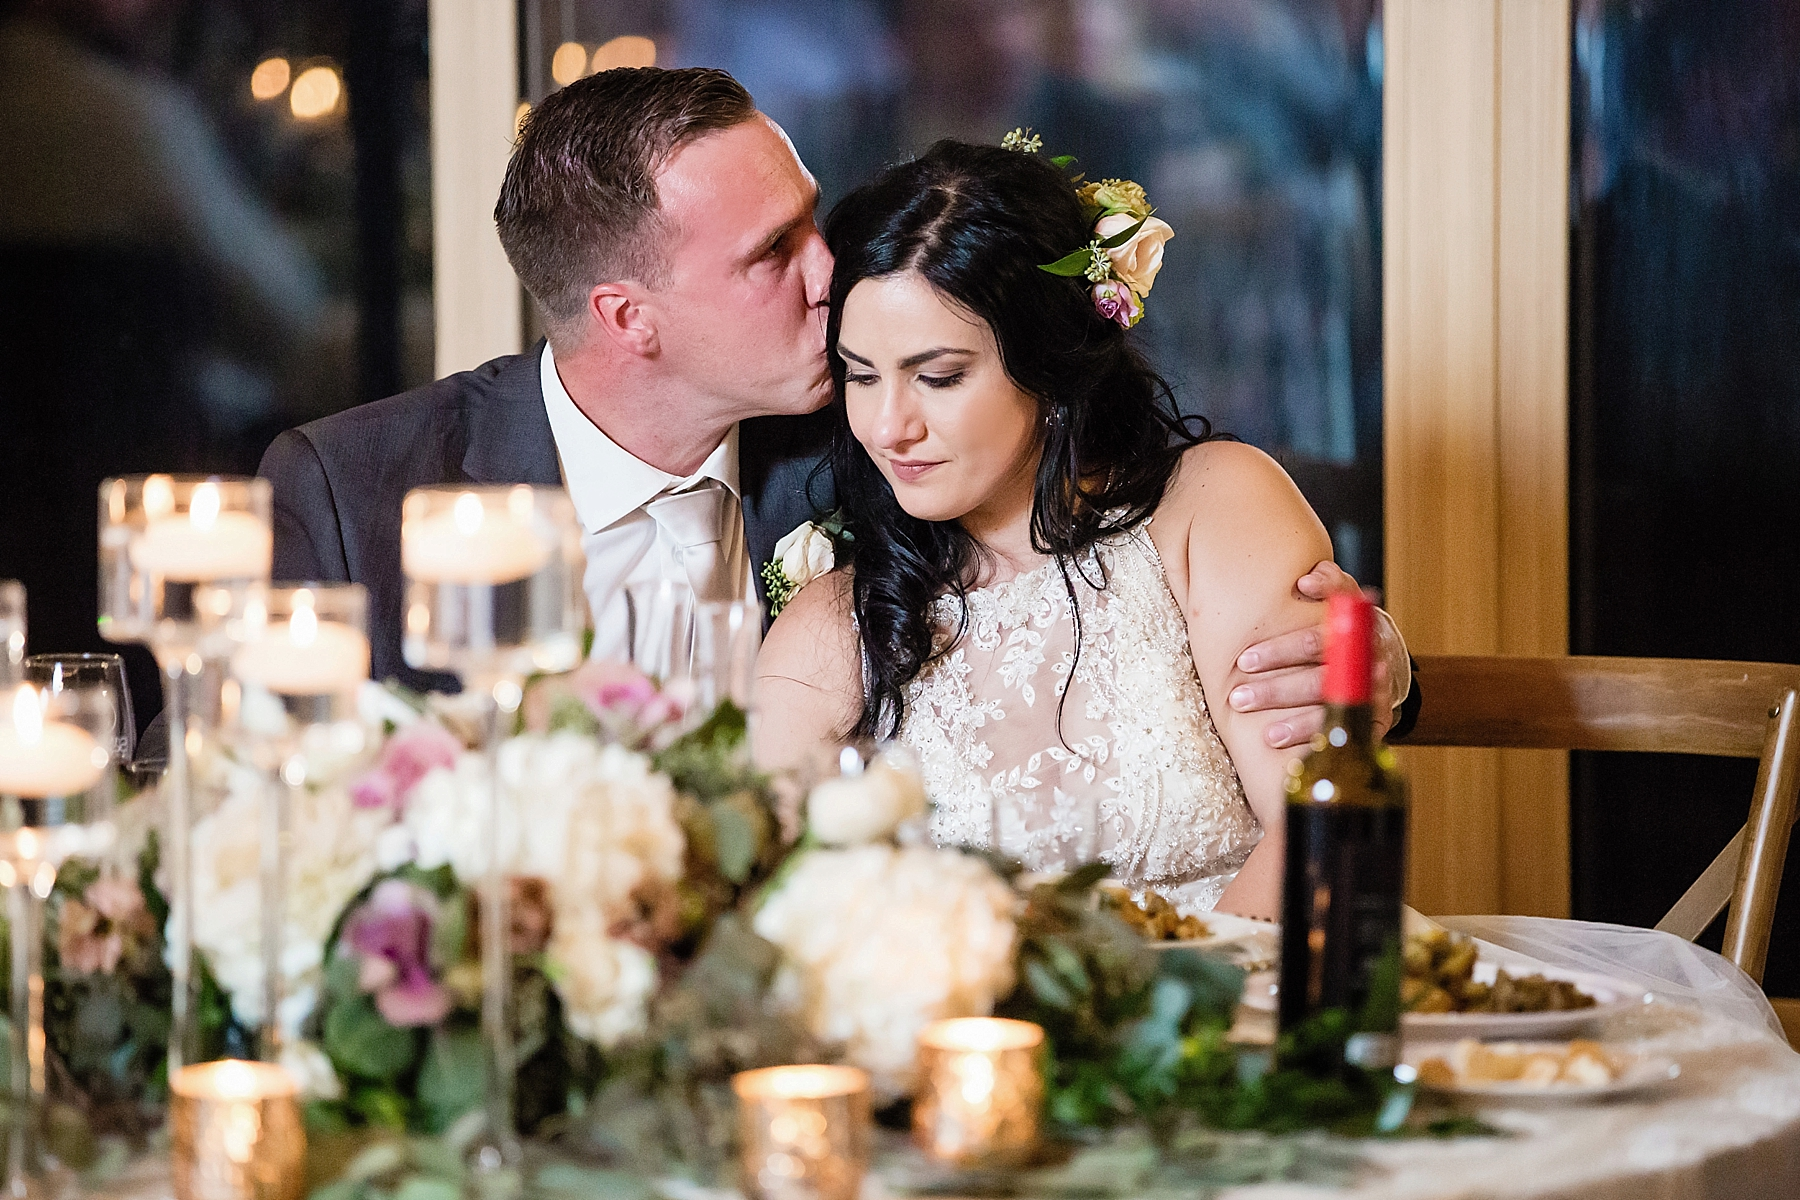 windsor-wedding-photographer-sprucewood-shores-winery-wedding-niagara-on-the-lake-wedding-photographer-eryn-shea-photography_0086.jpg